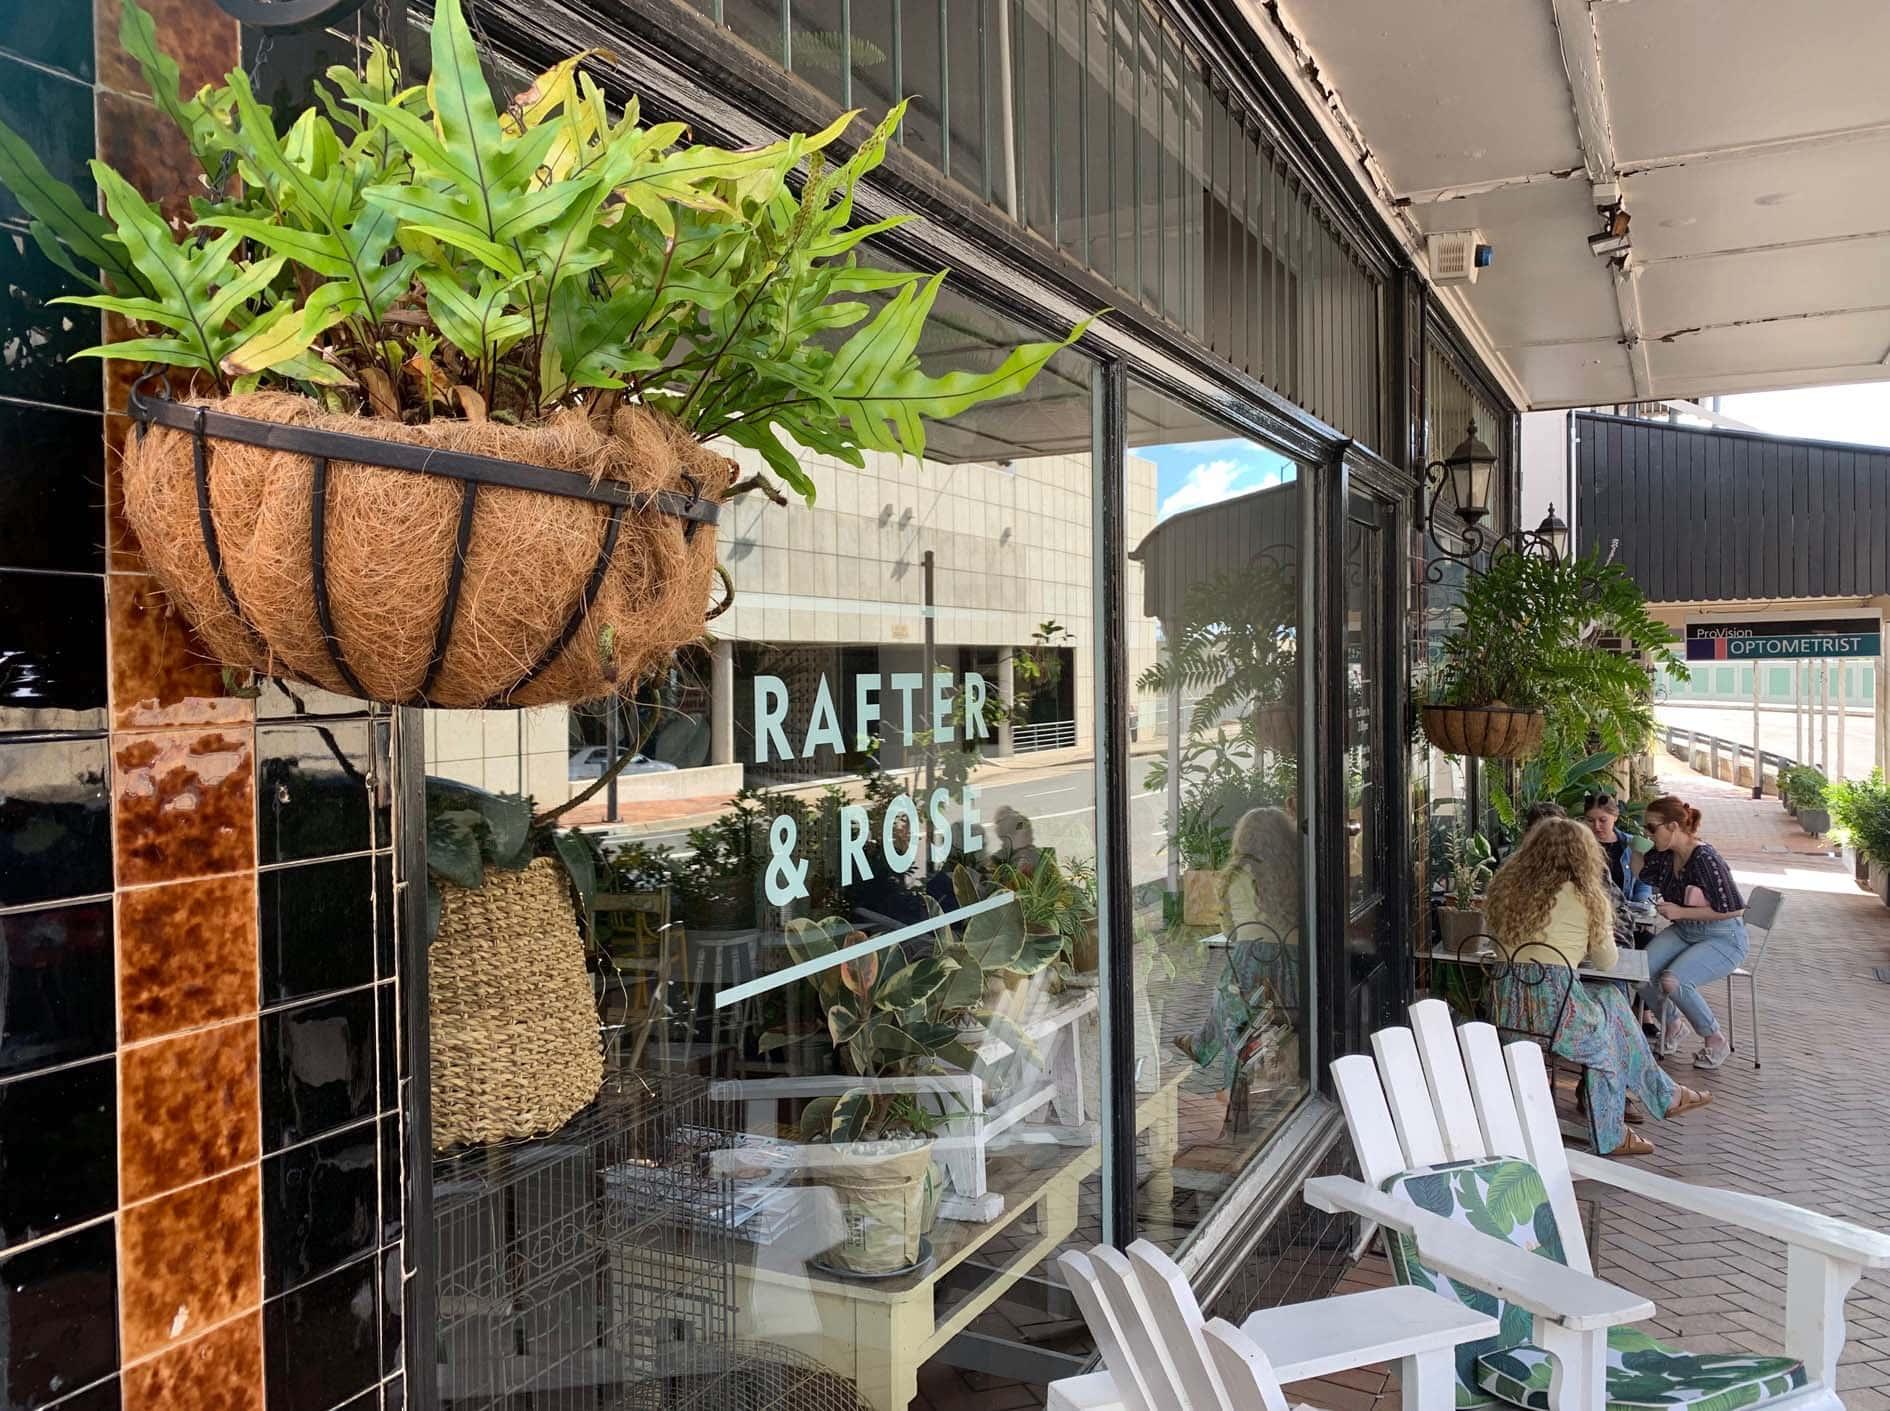 Rafter & Rose